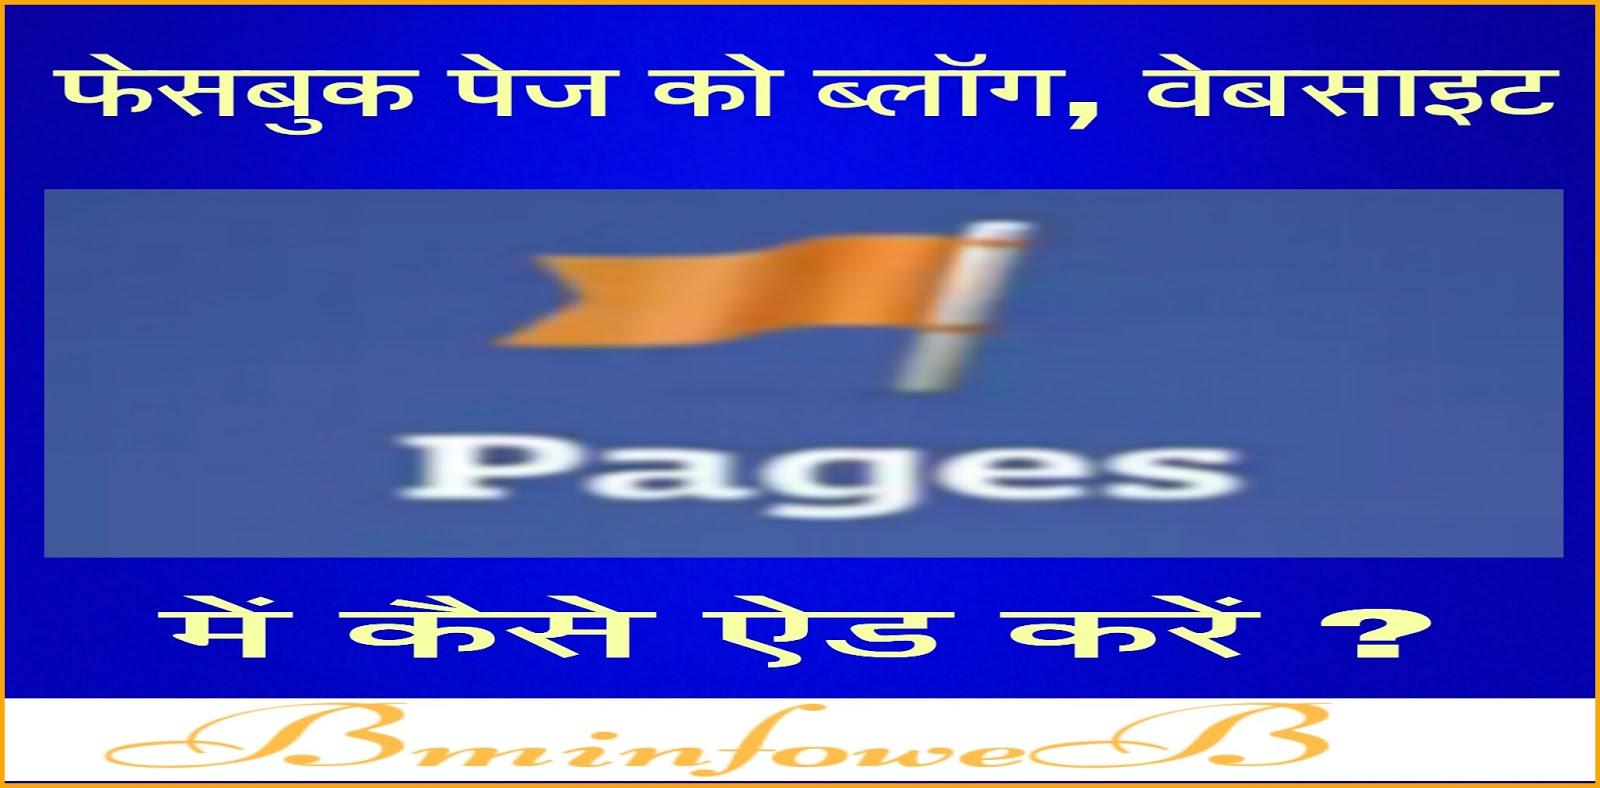 Facebook Page Ko Blog, Website Me Kaise Add Kare? - BM infoweb